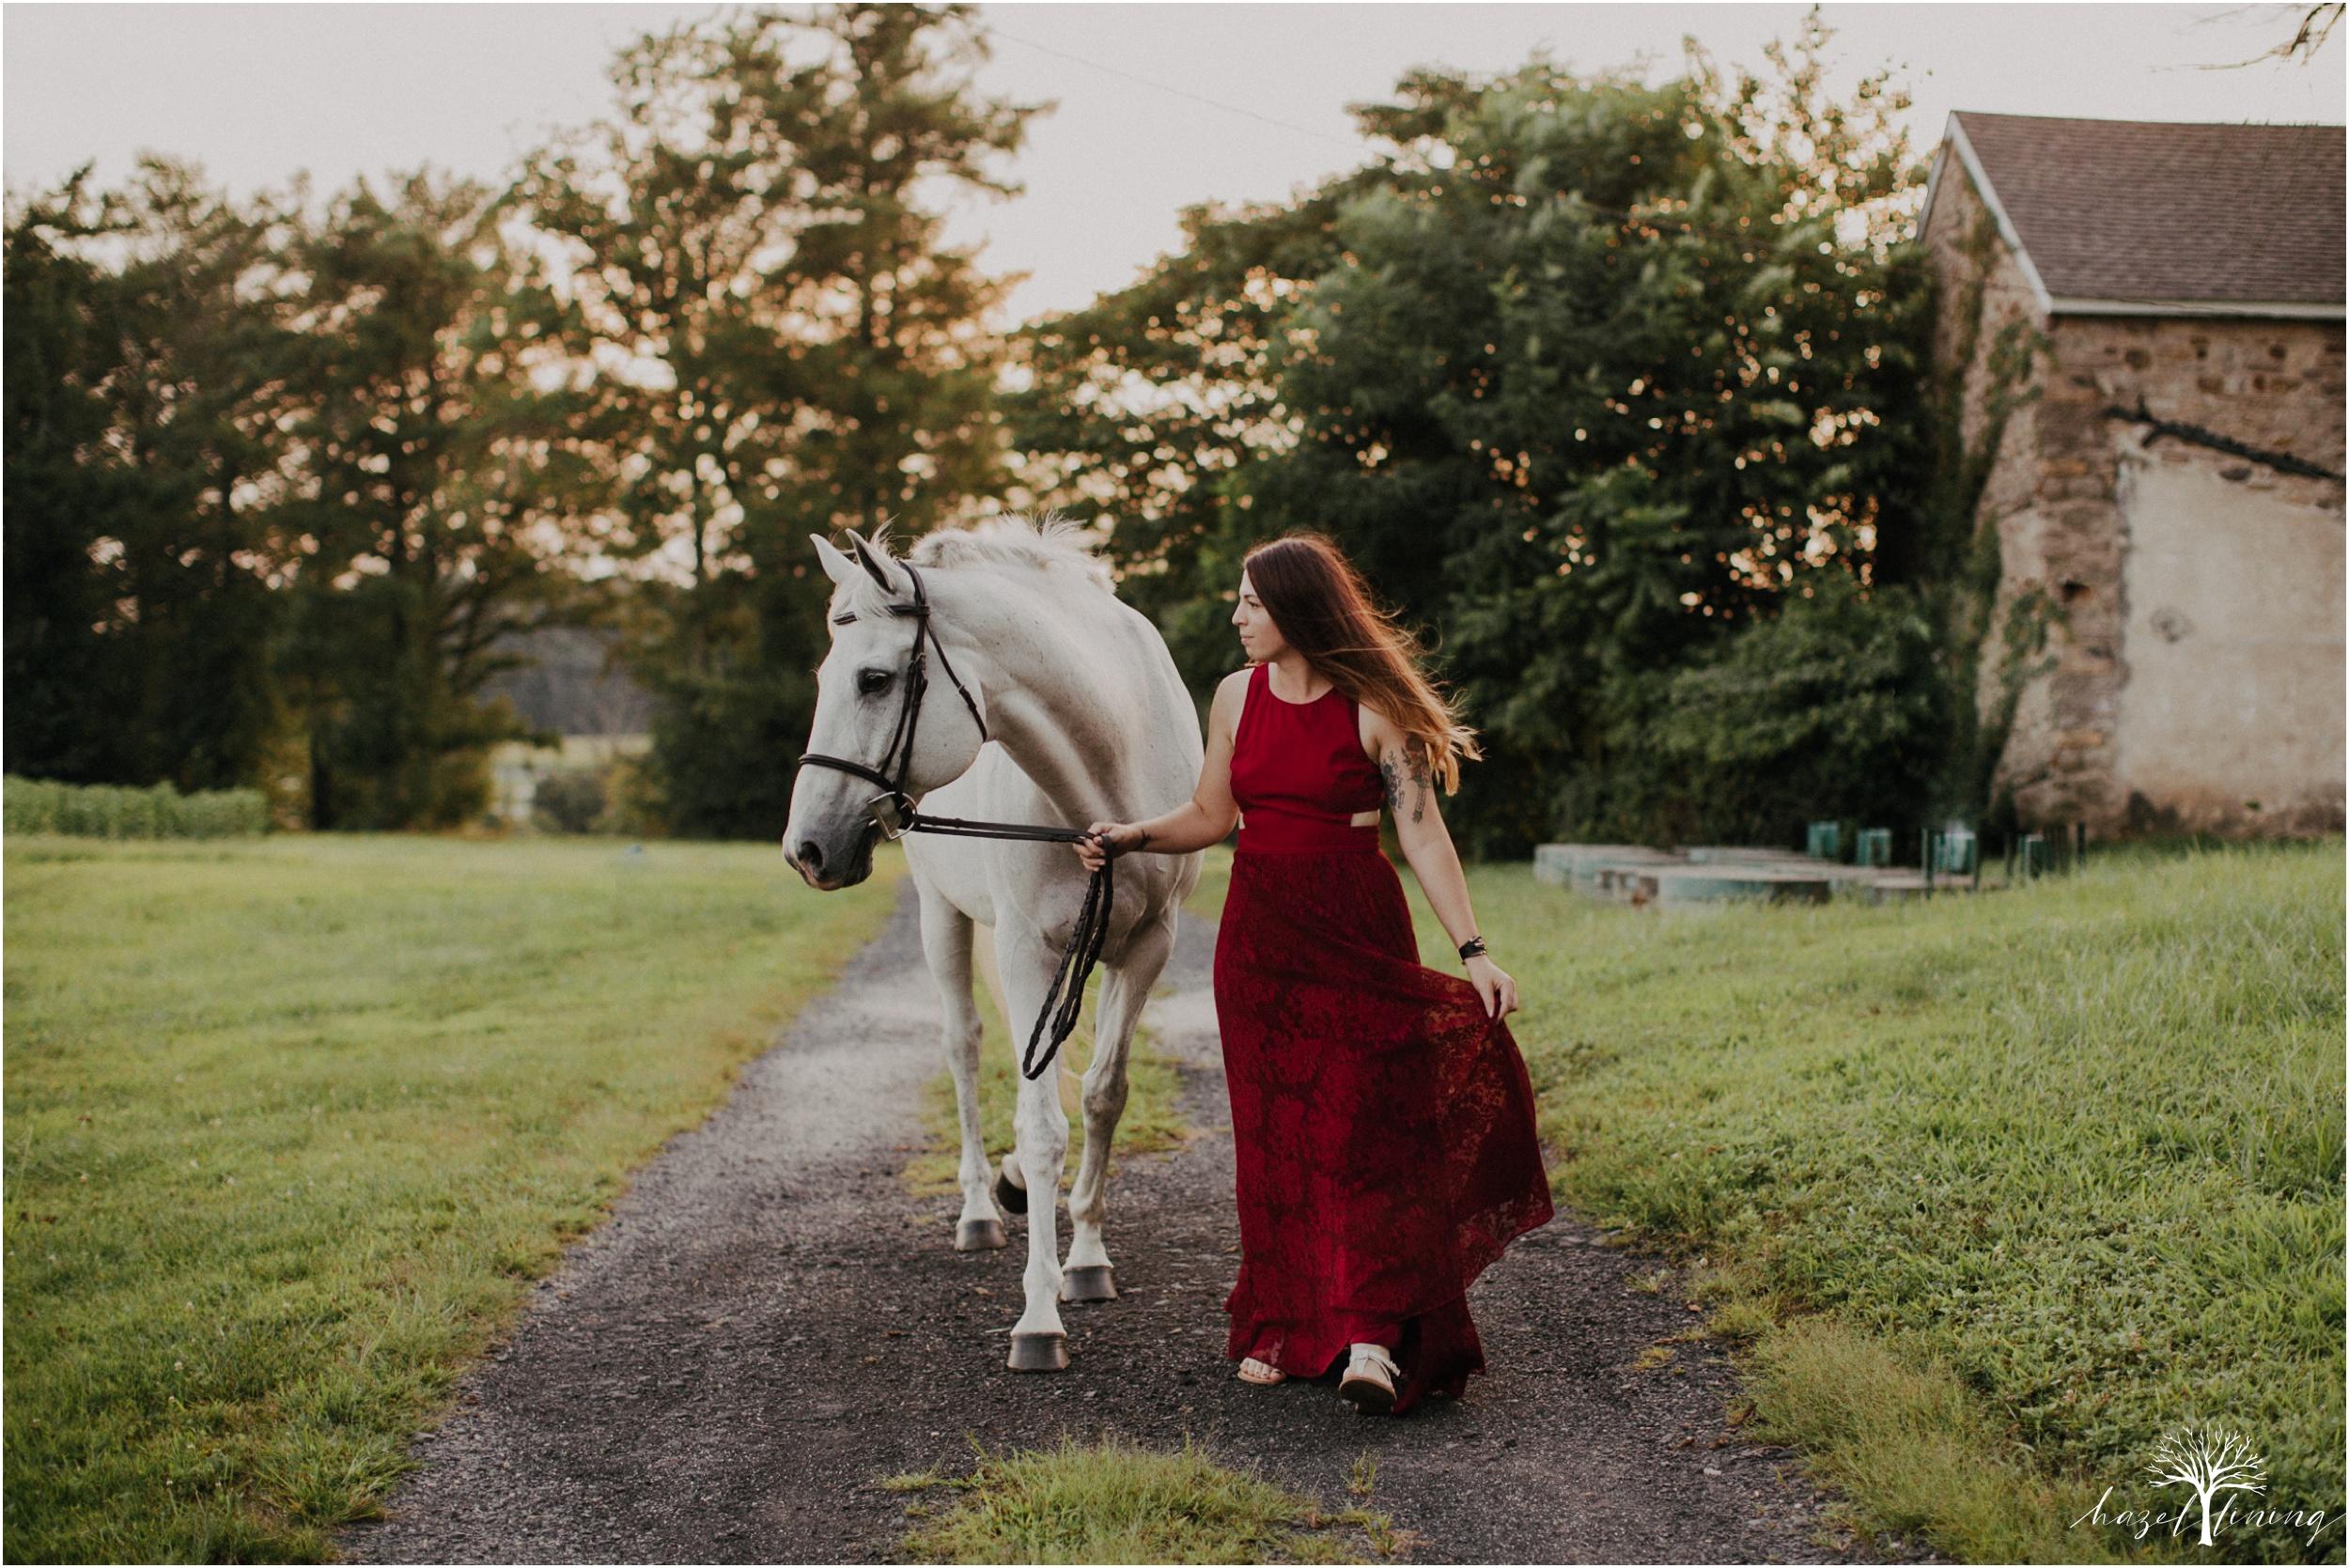 taylor-adams-and-horse-delaware-valley-university-delval-summer-equestrian-portrait-session-hazel-lining-photography-destination-elopement-wedding-engagement-photography_0060.jpg